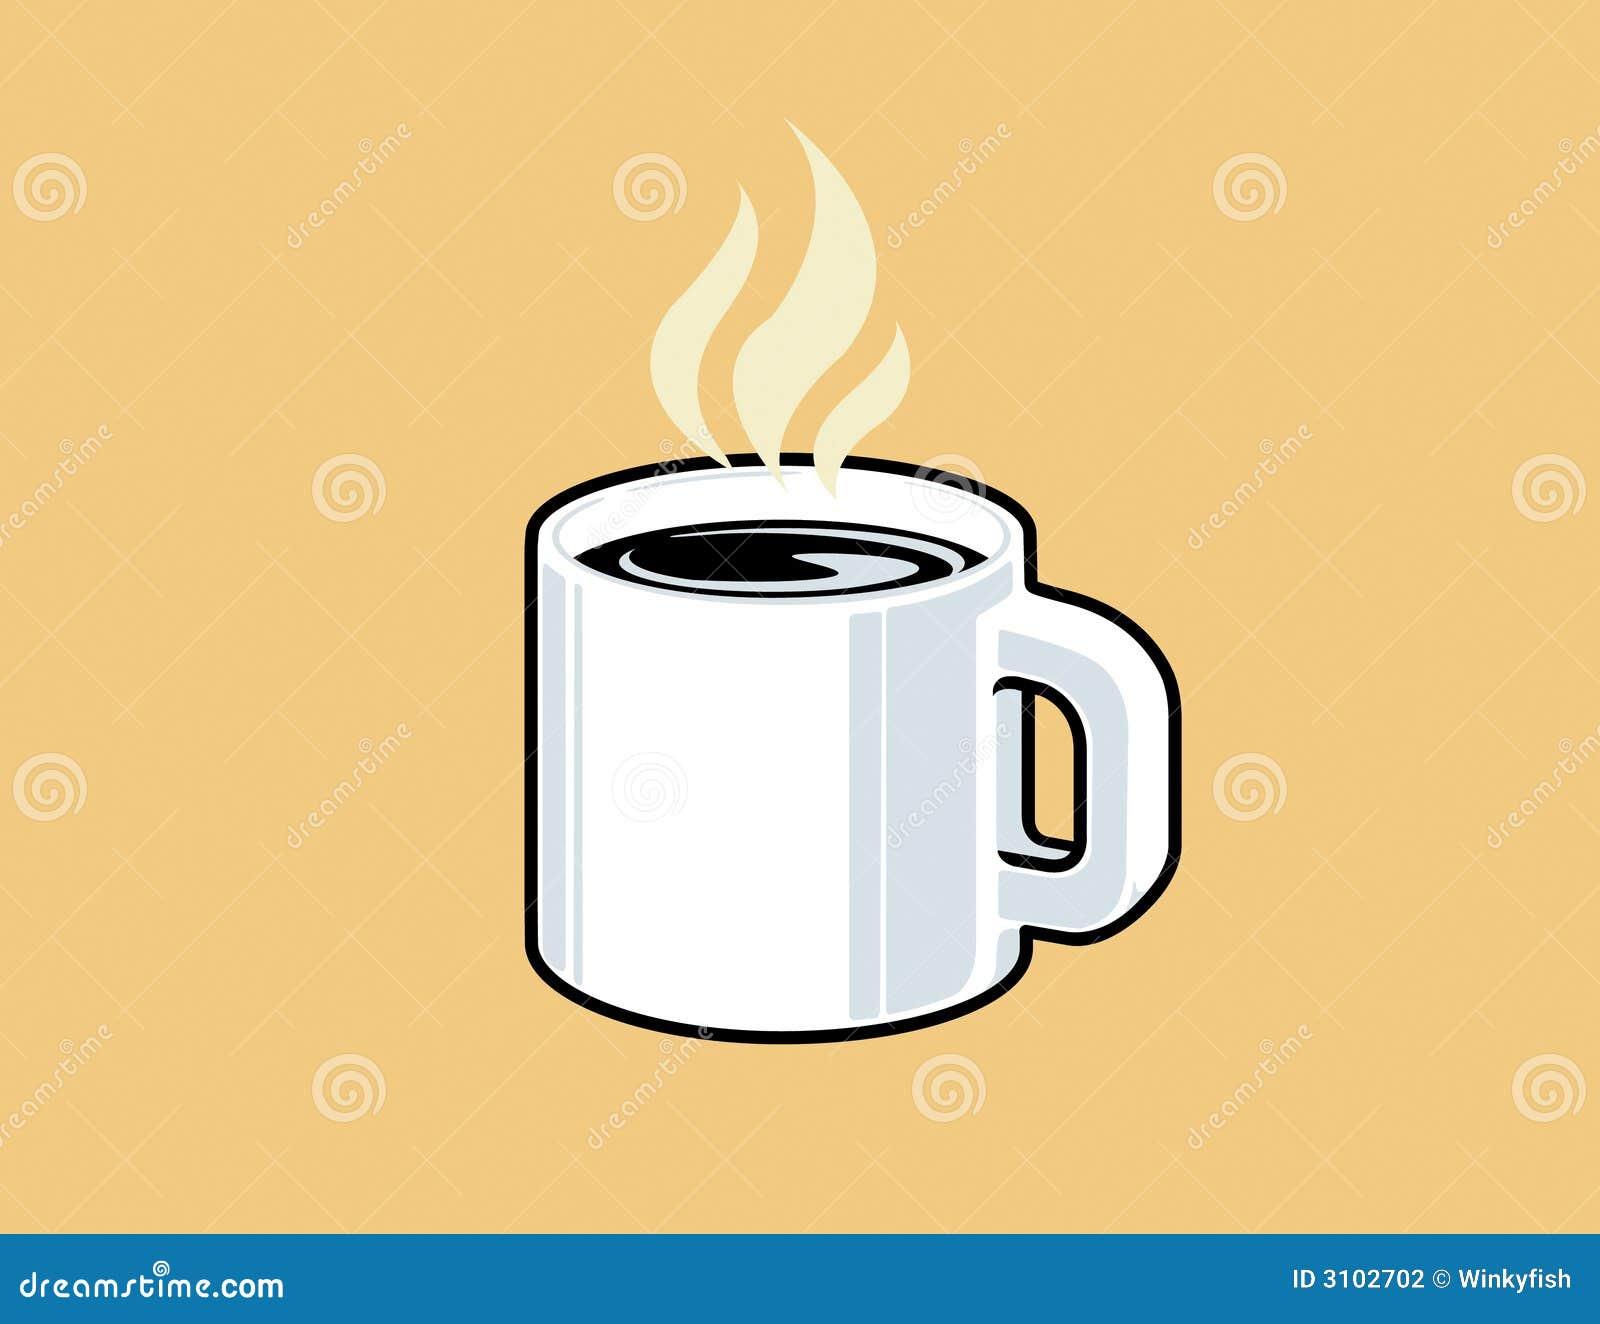 Steaming Mug Of Coffee Stock Vector Illustration Of Beige 3102702